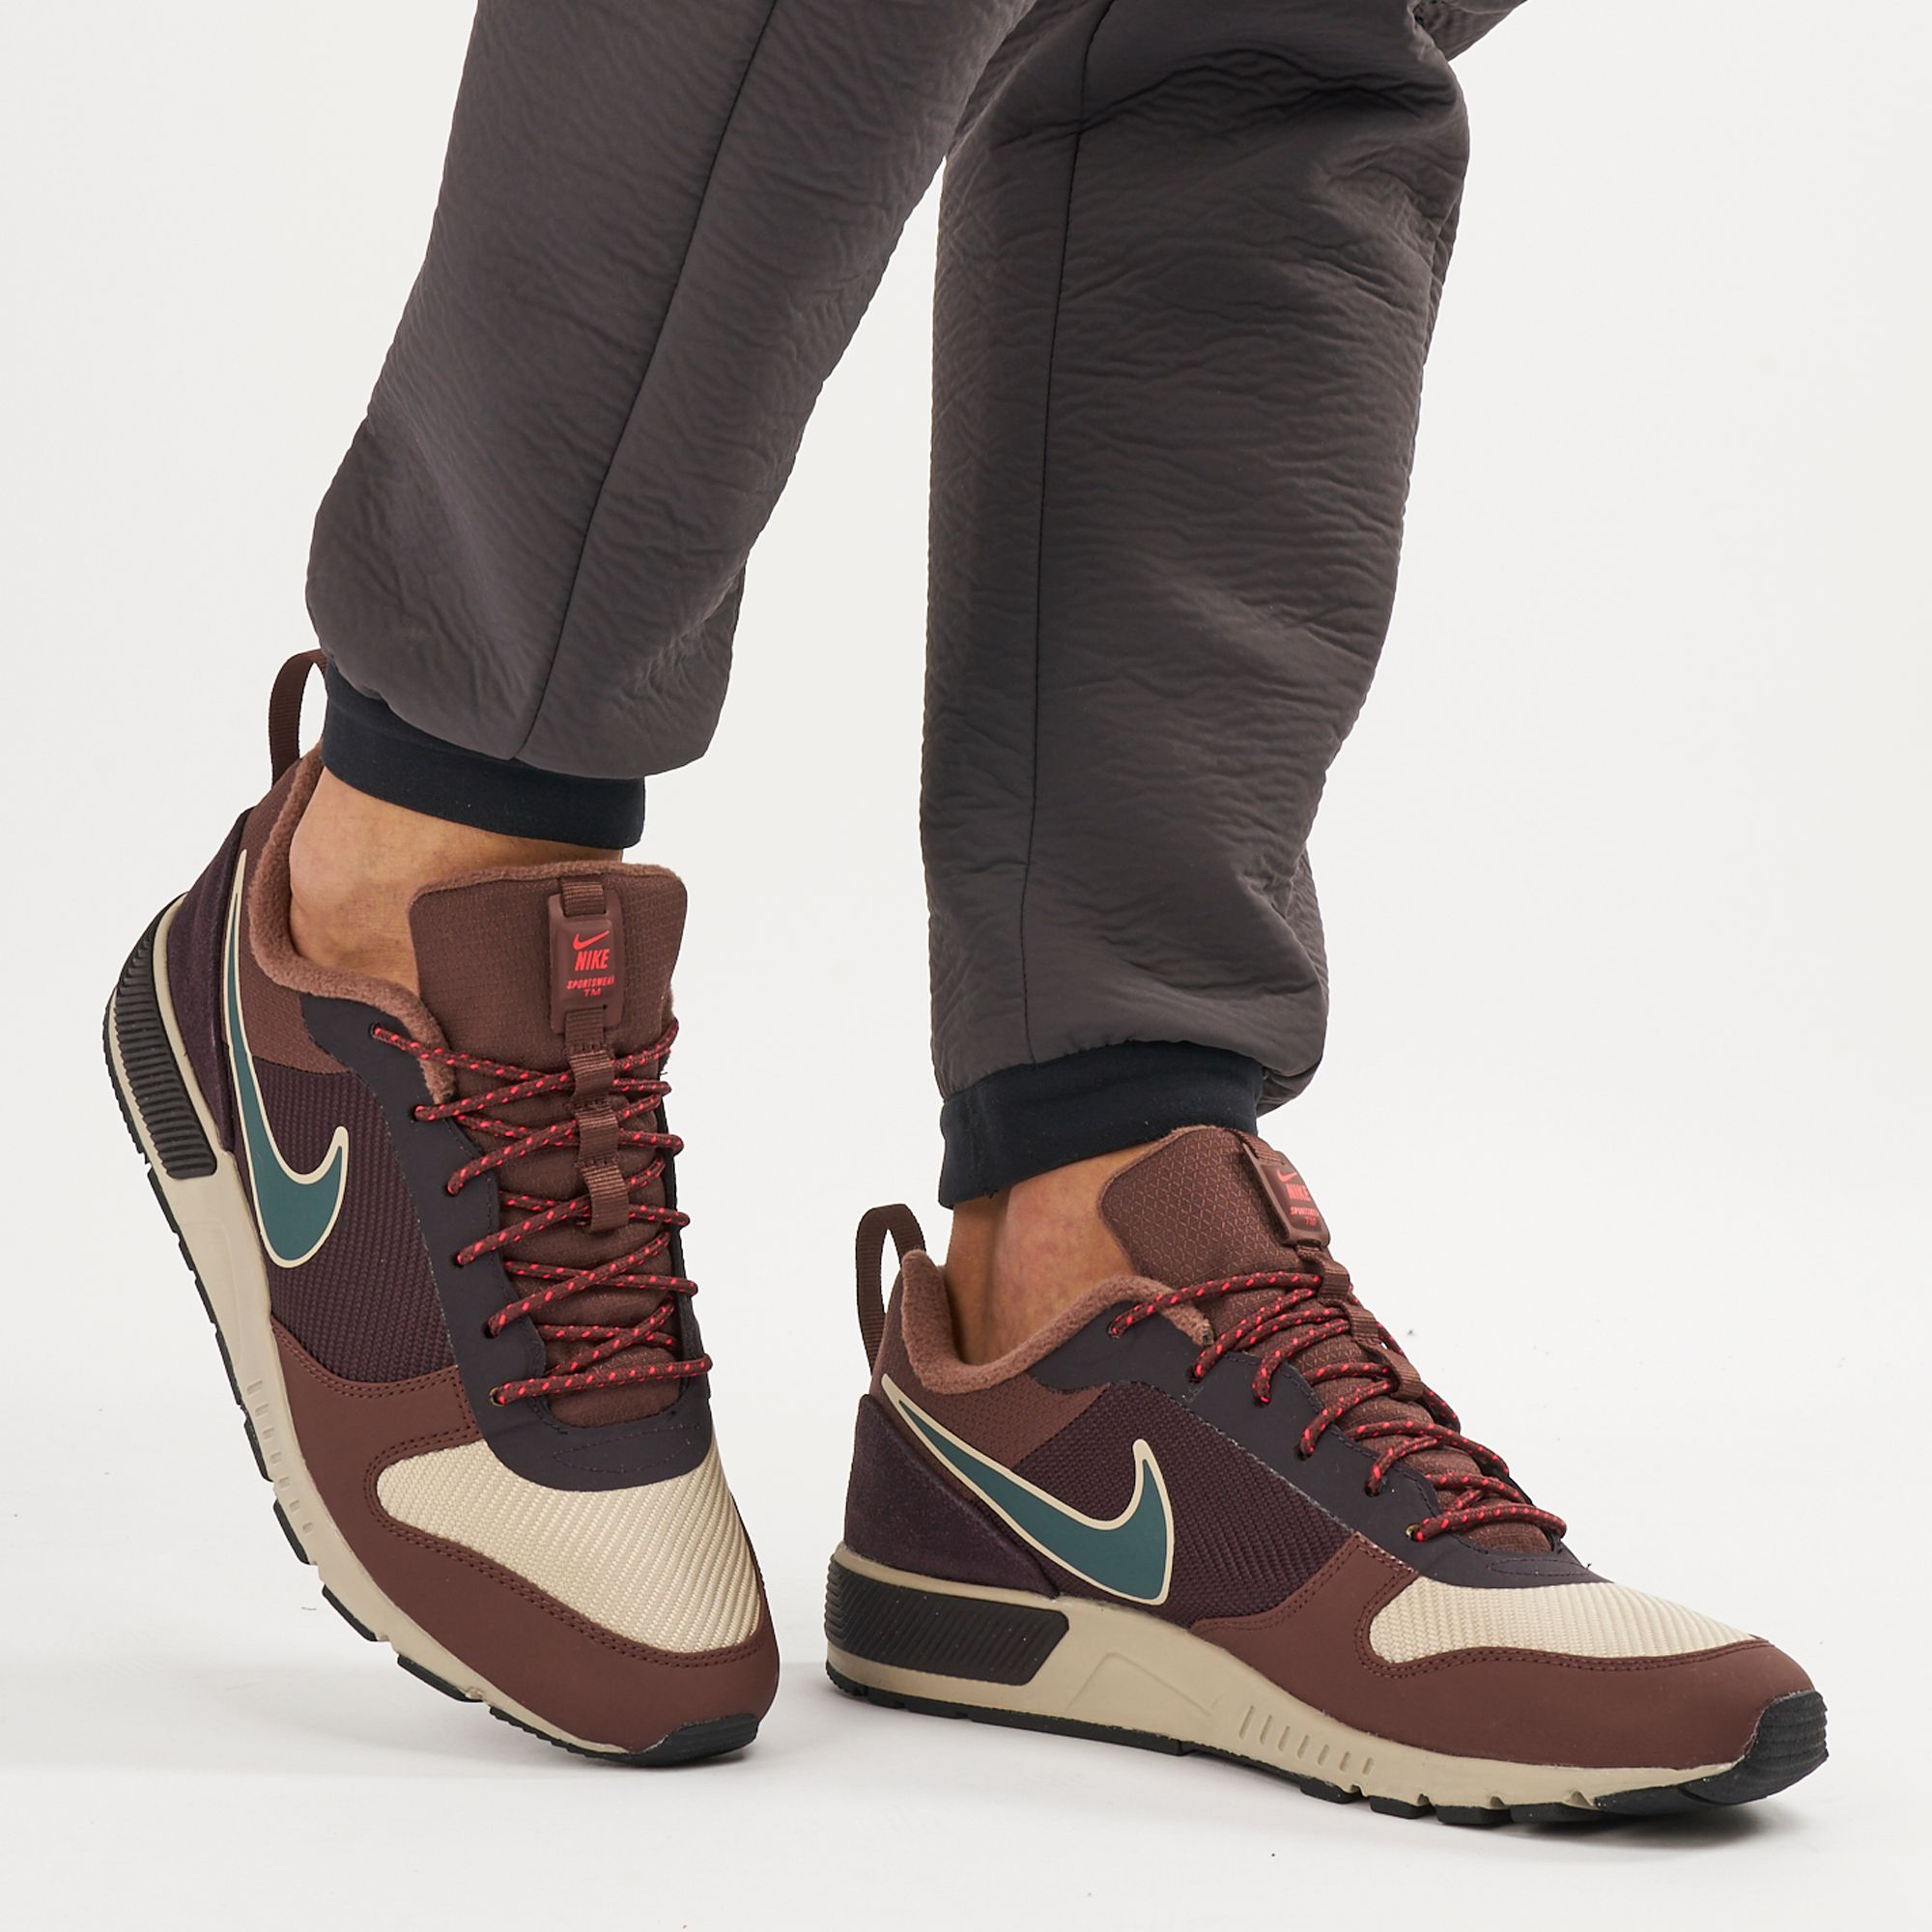 buy online 79c54 985d7 Nike Nightgazer Trail Shoe